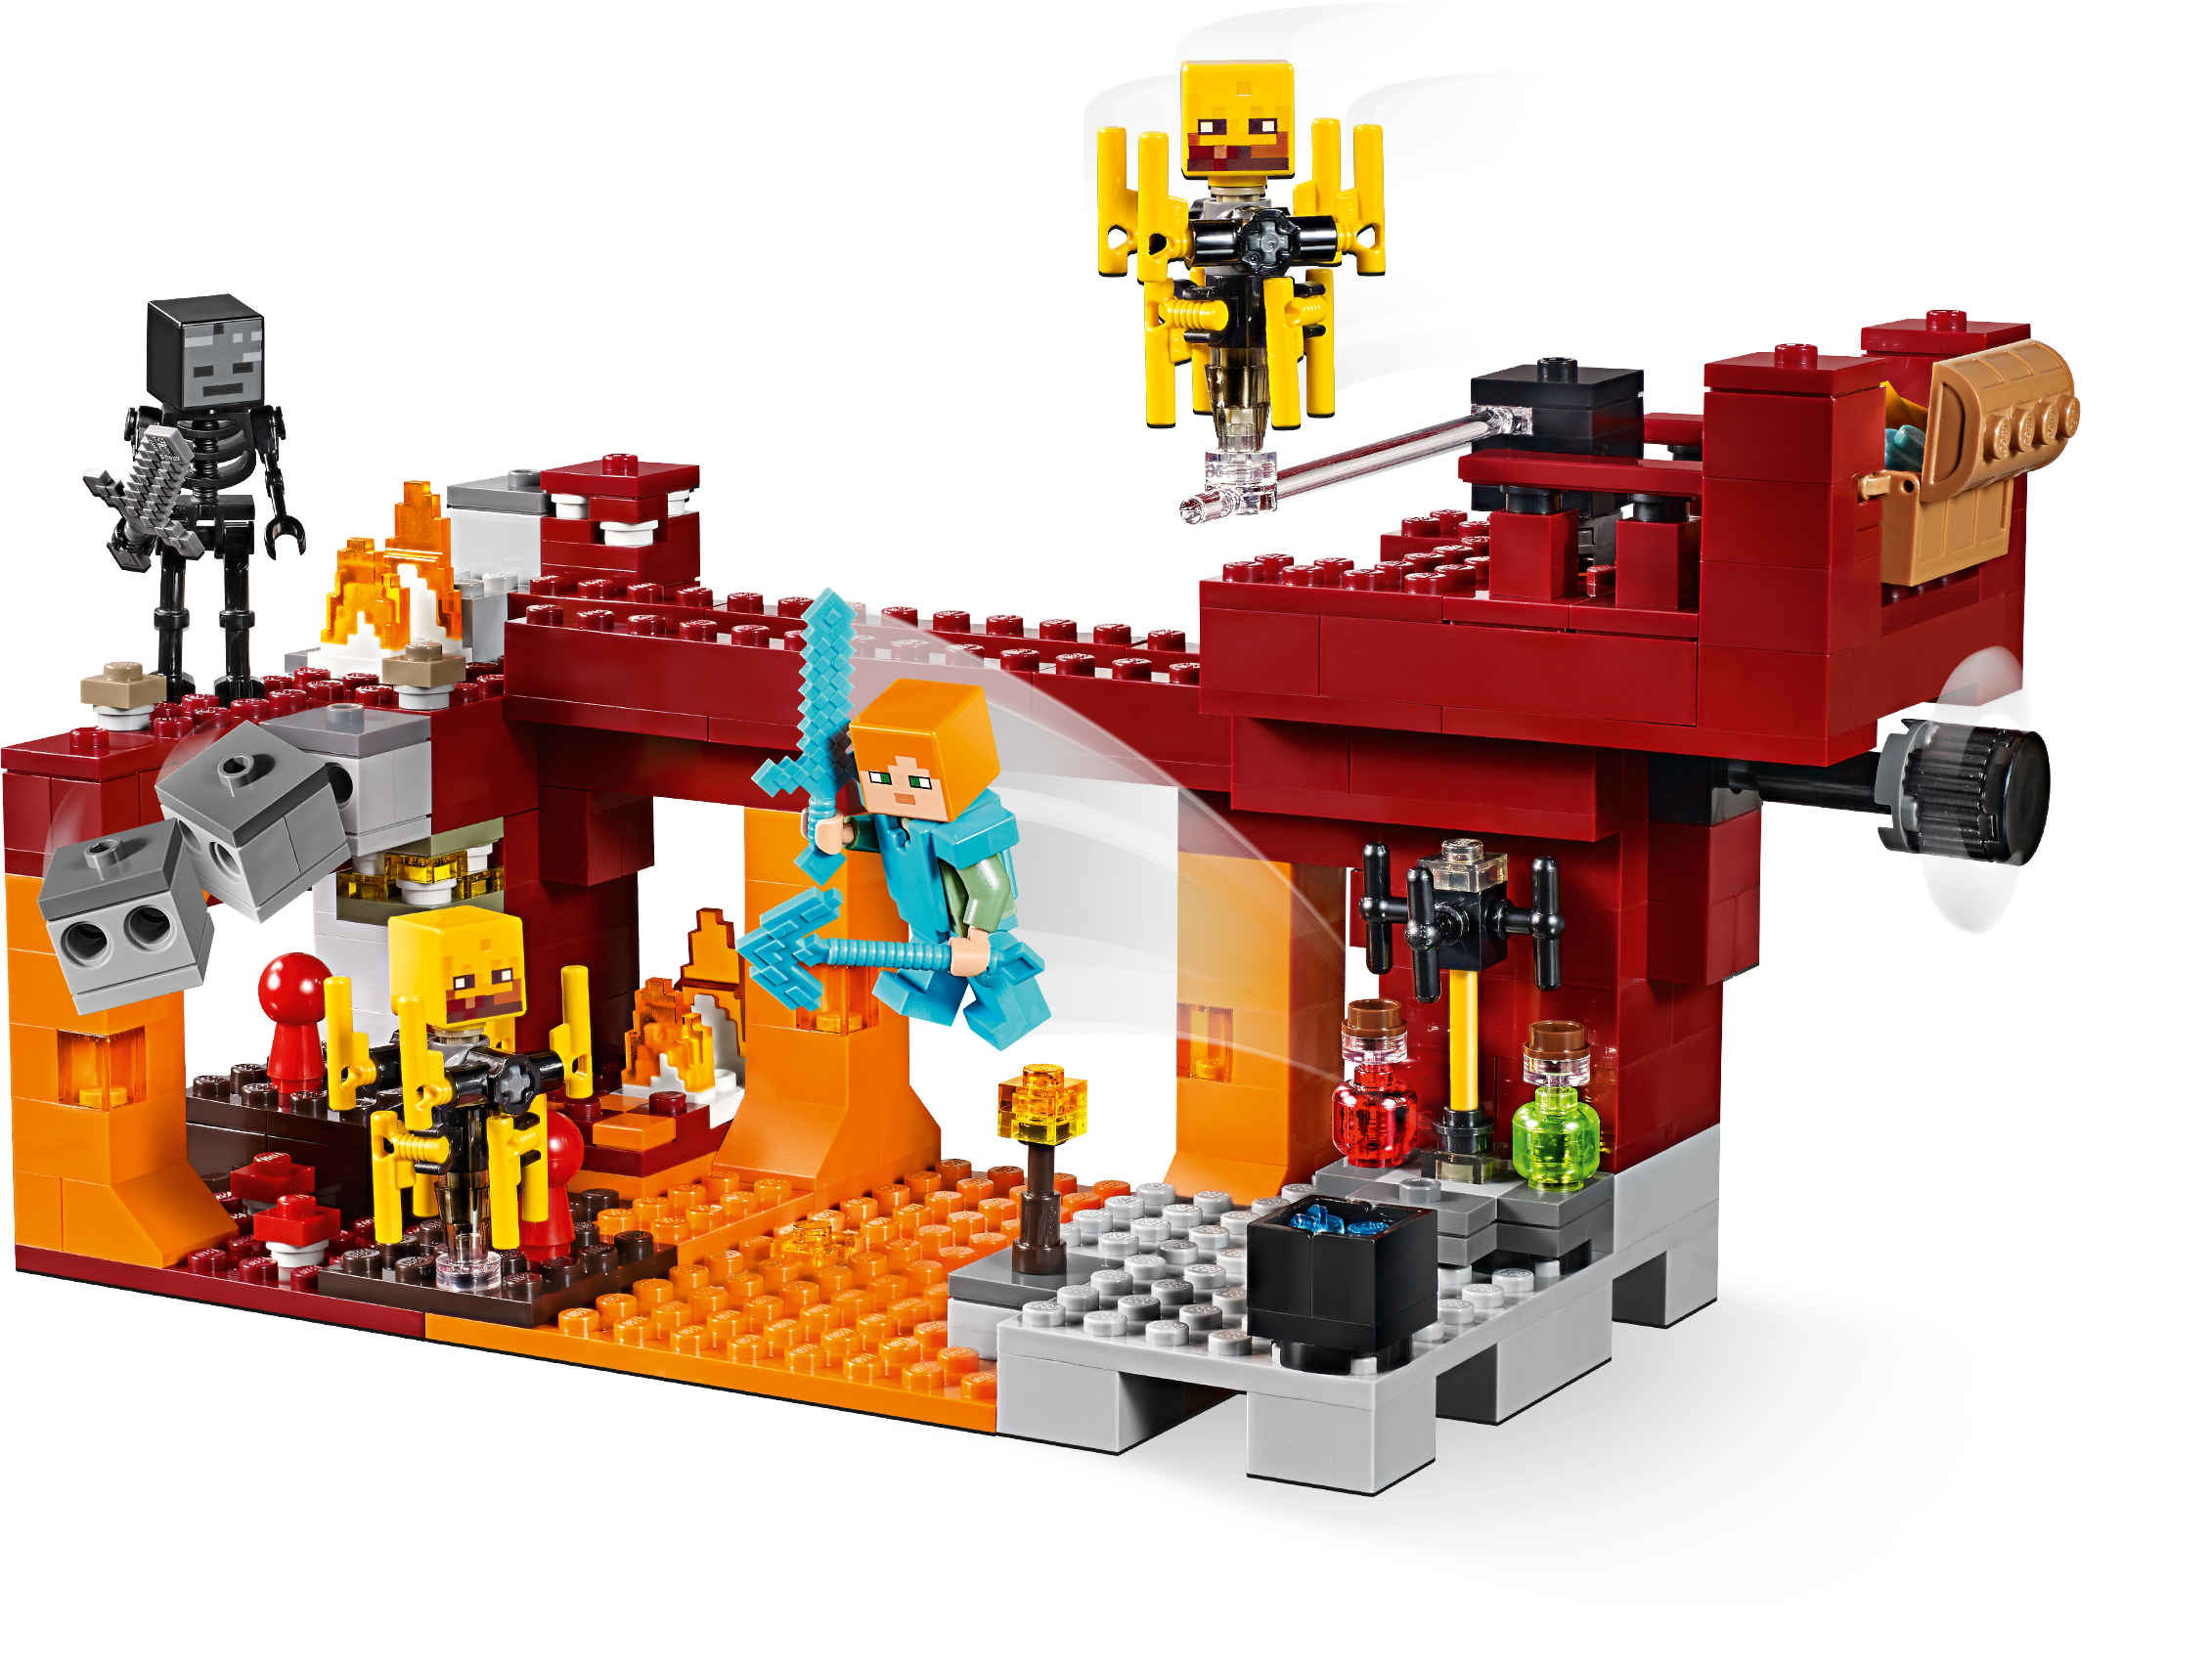 The Blaze Bridge